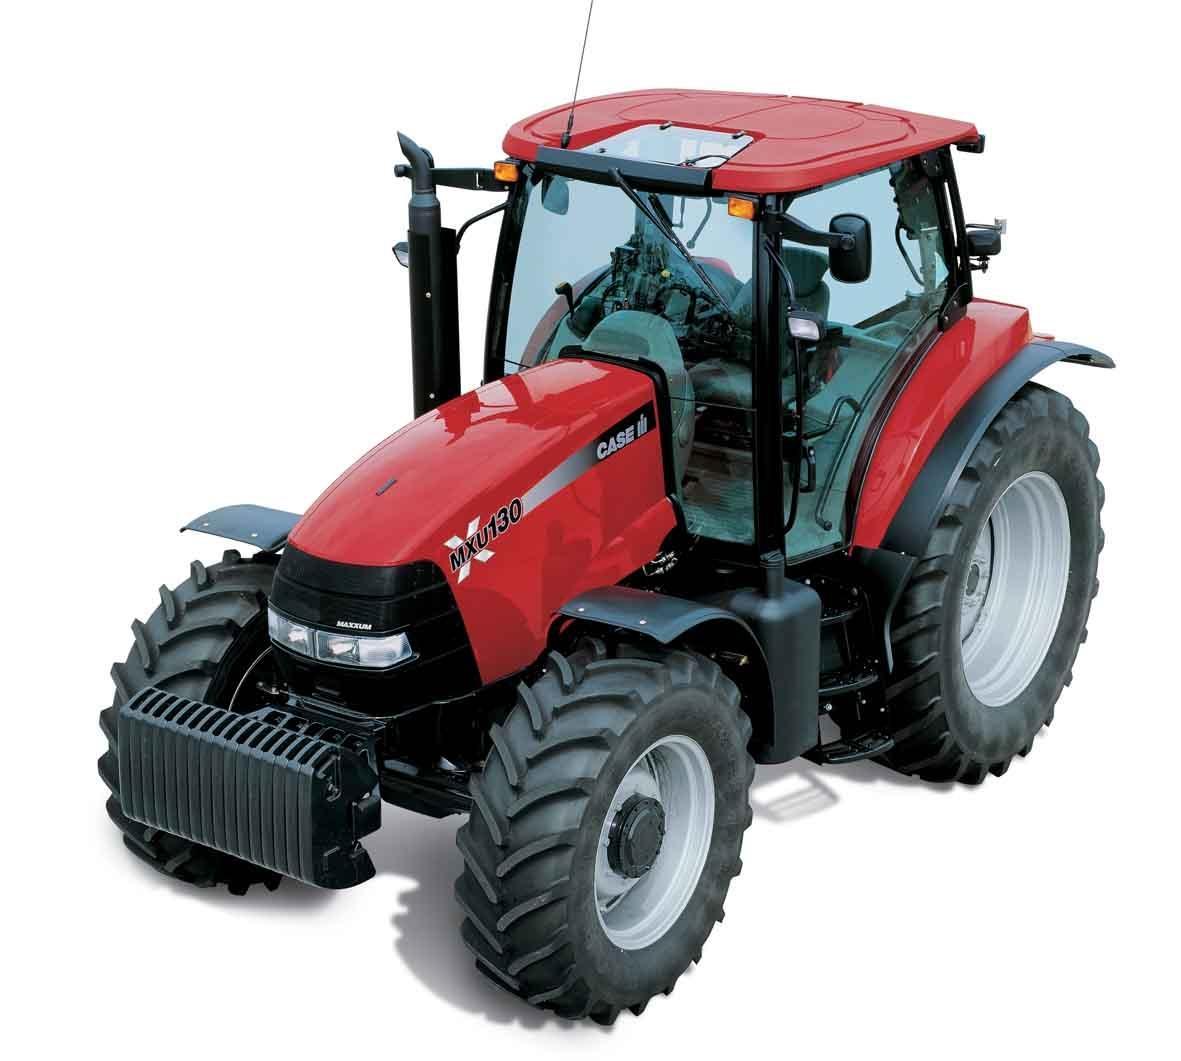 avis mxu 130x line de la marque case ih tracteurs agricoles. Black Bedroom Furniture Sets. Home Design Ideas